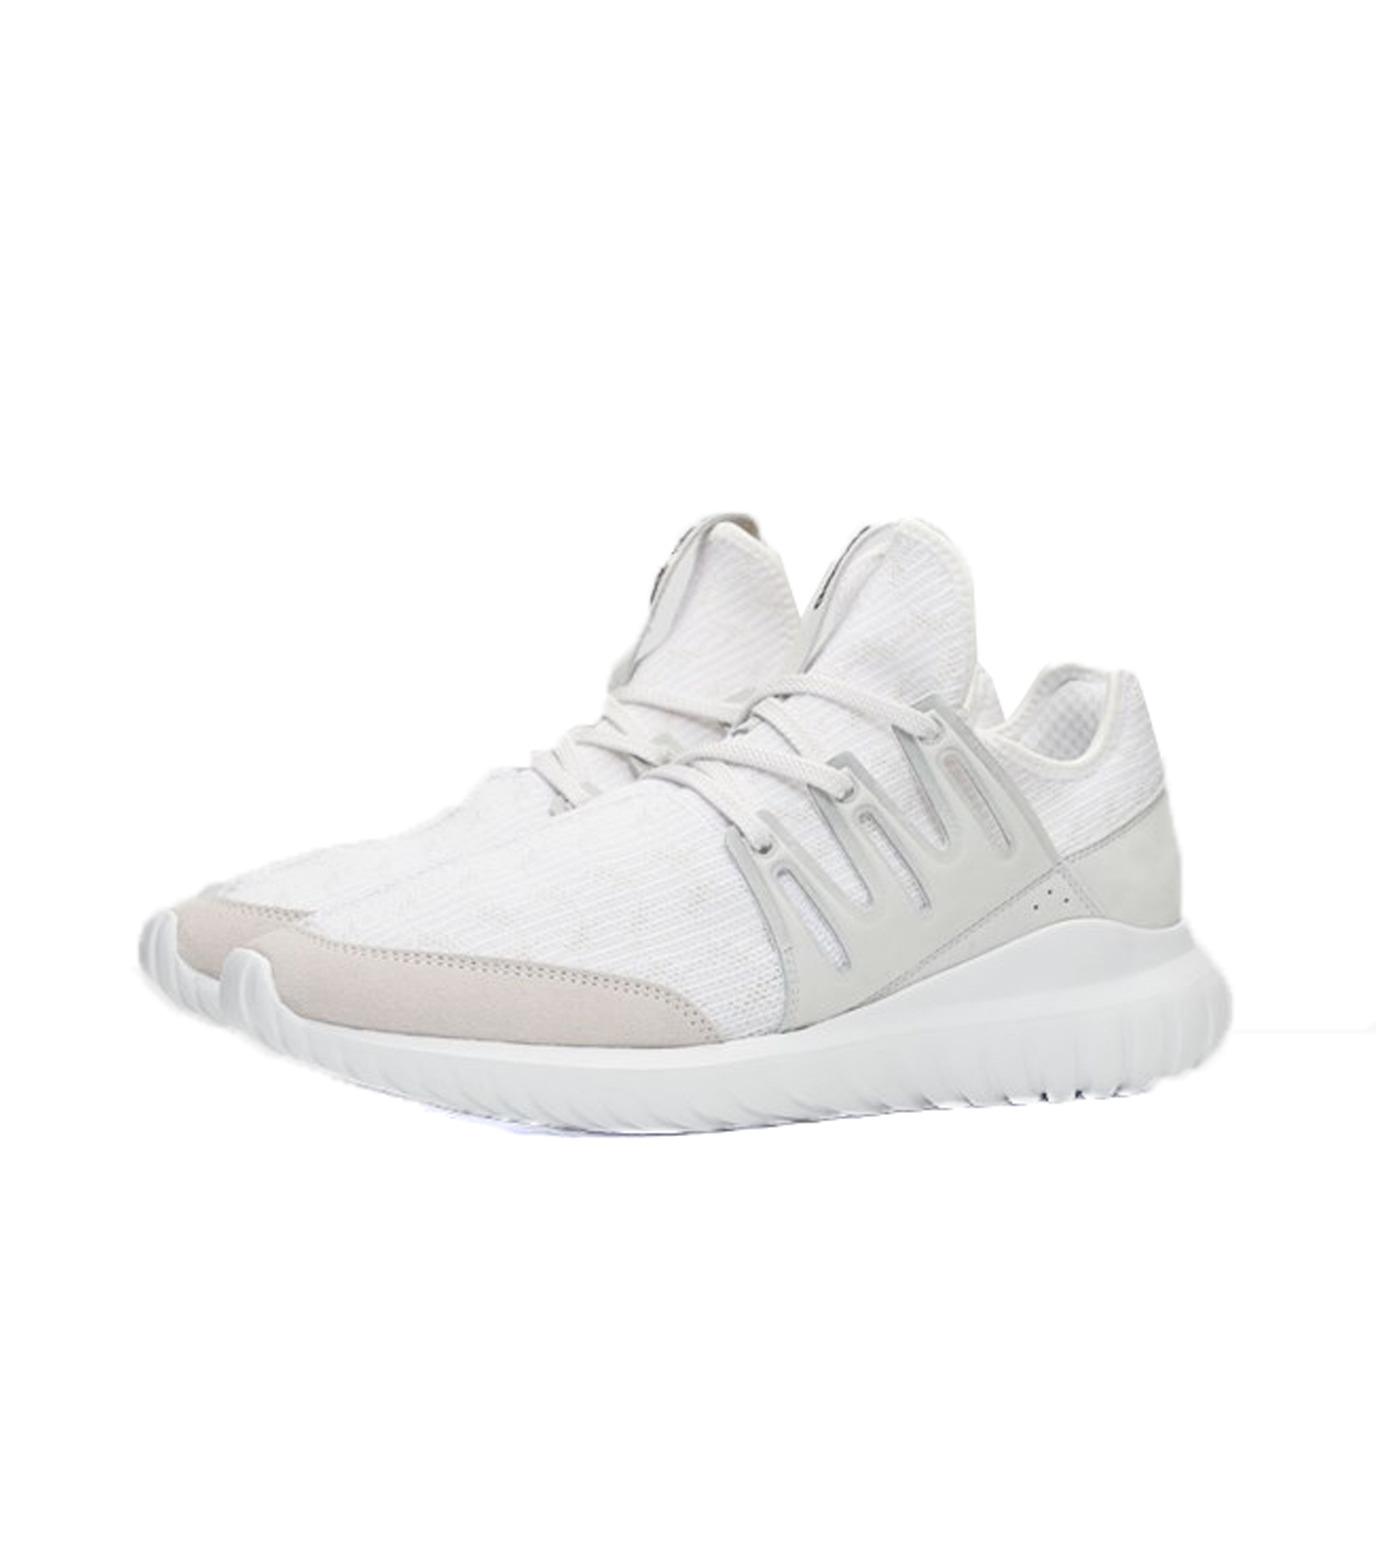 adidas(アディダス)のTUBULAR RADIAL PK-WHITE(シューズ/shoes)-S76714-4 拡大詳細画像3